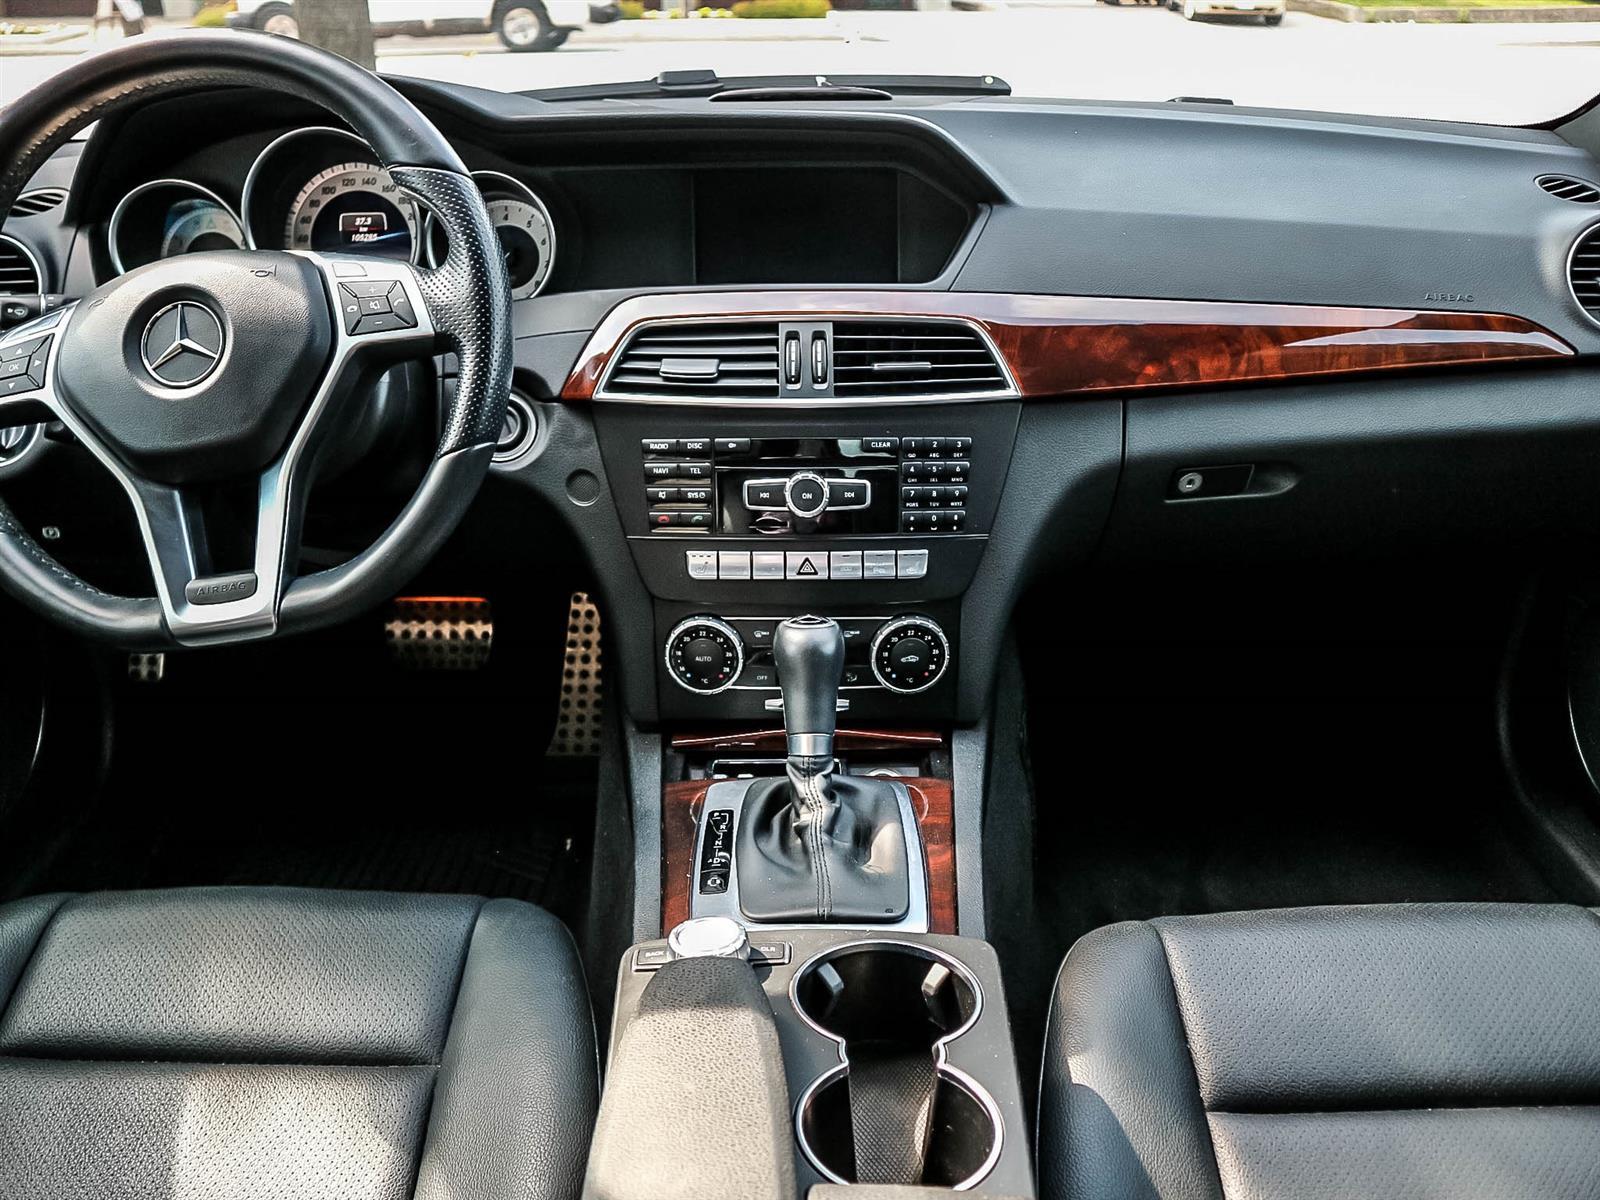 used 2014 Mercedes-Benz C300 car